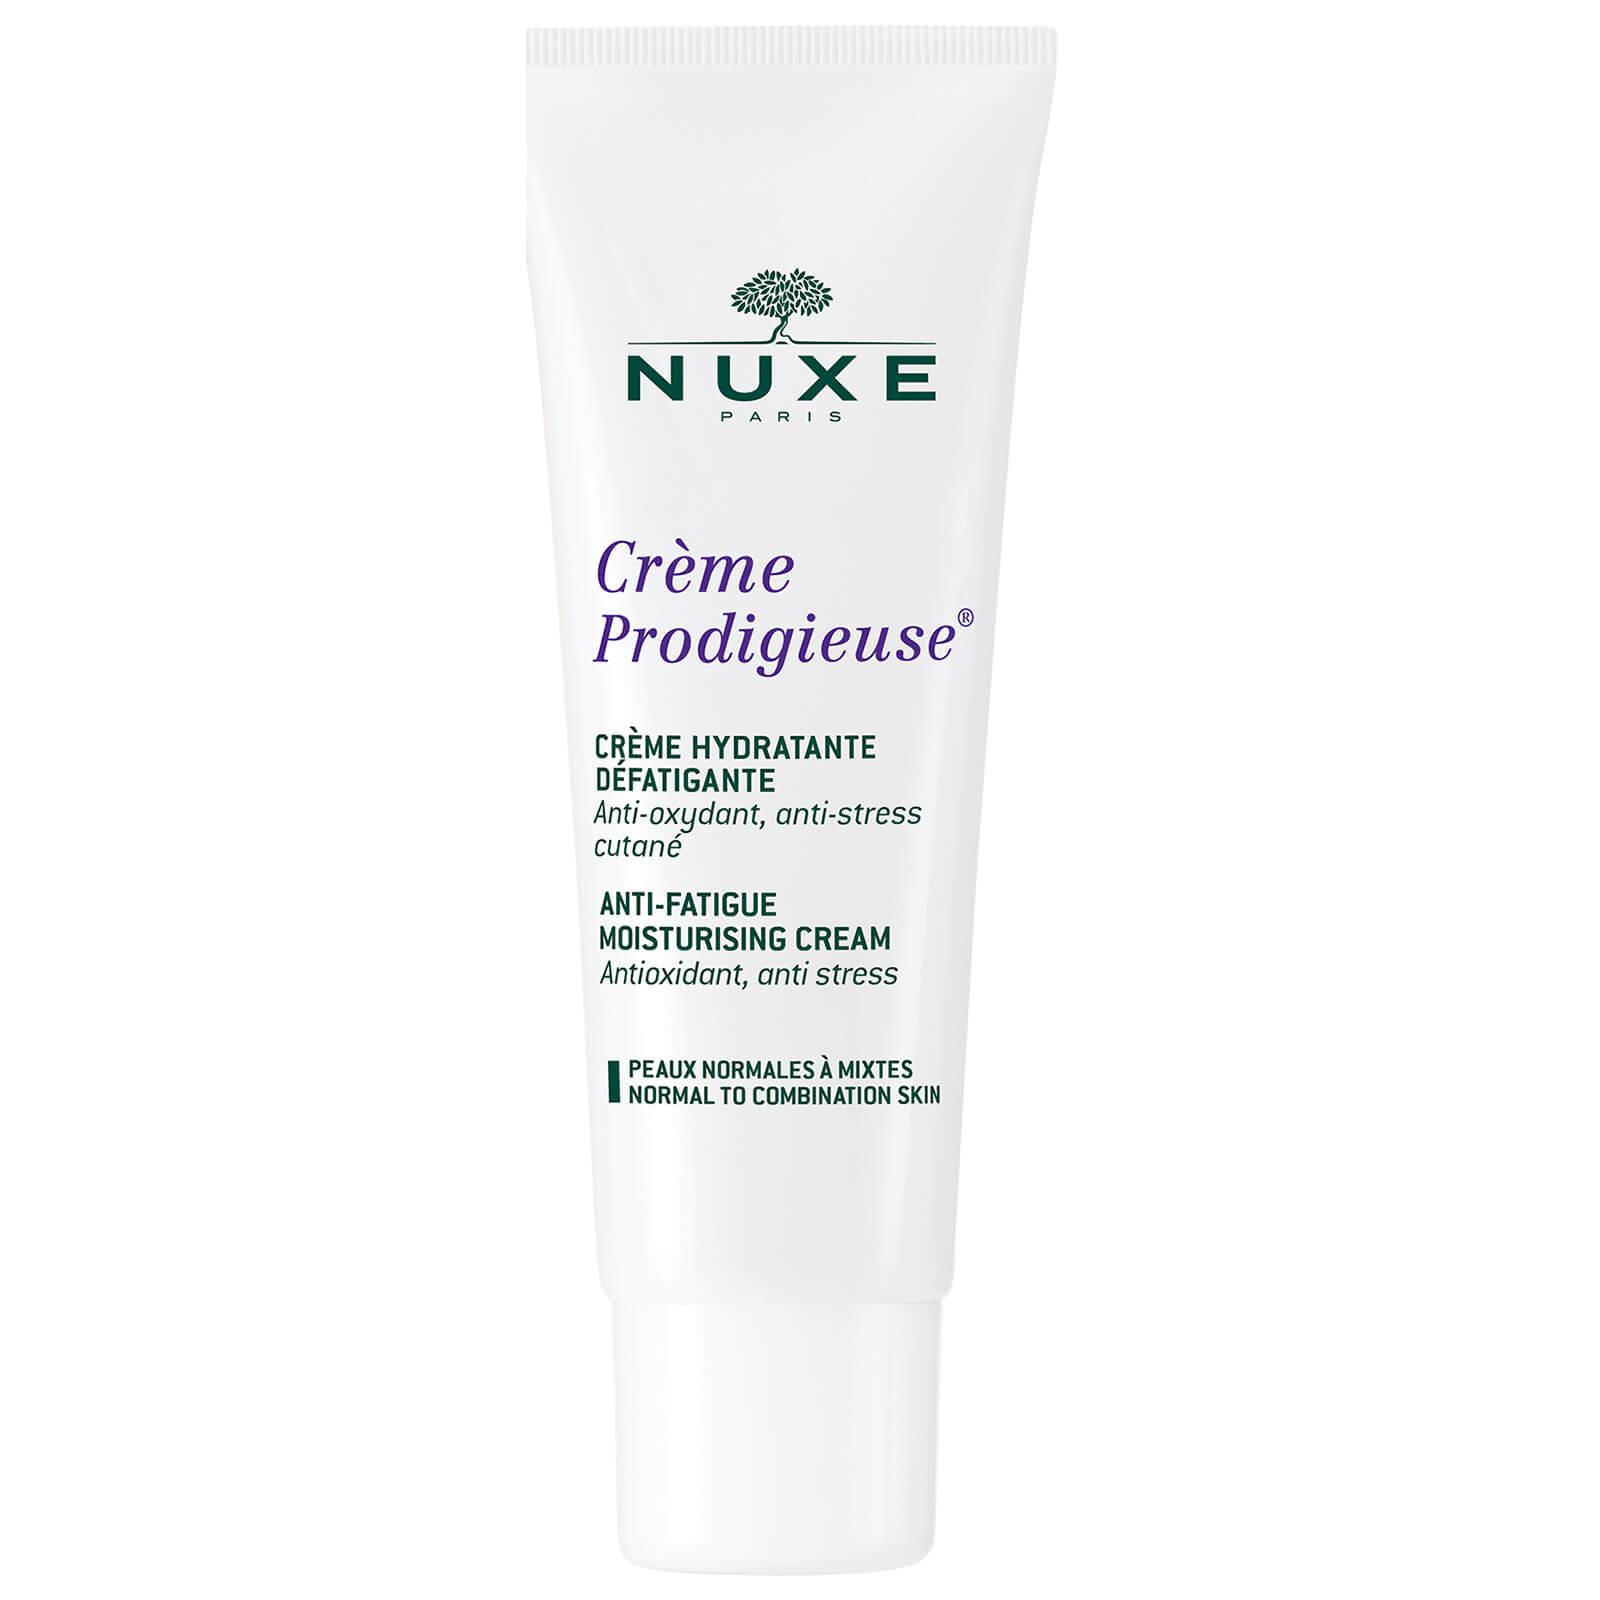 Nuxe best facial creams magnificent phrase